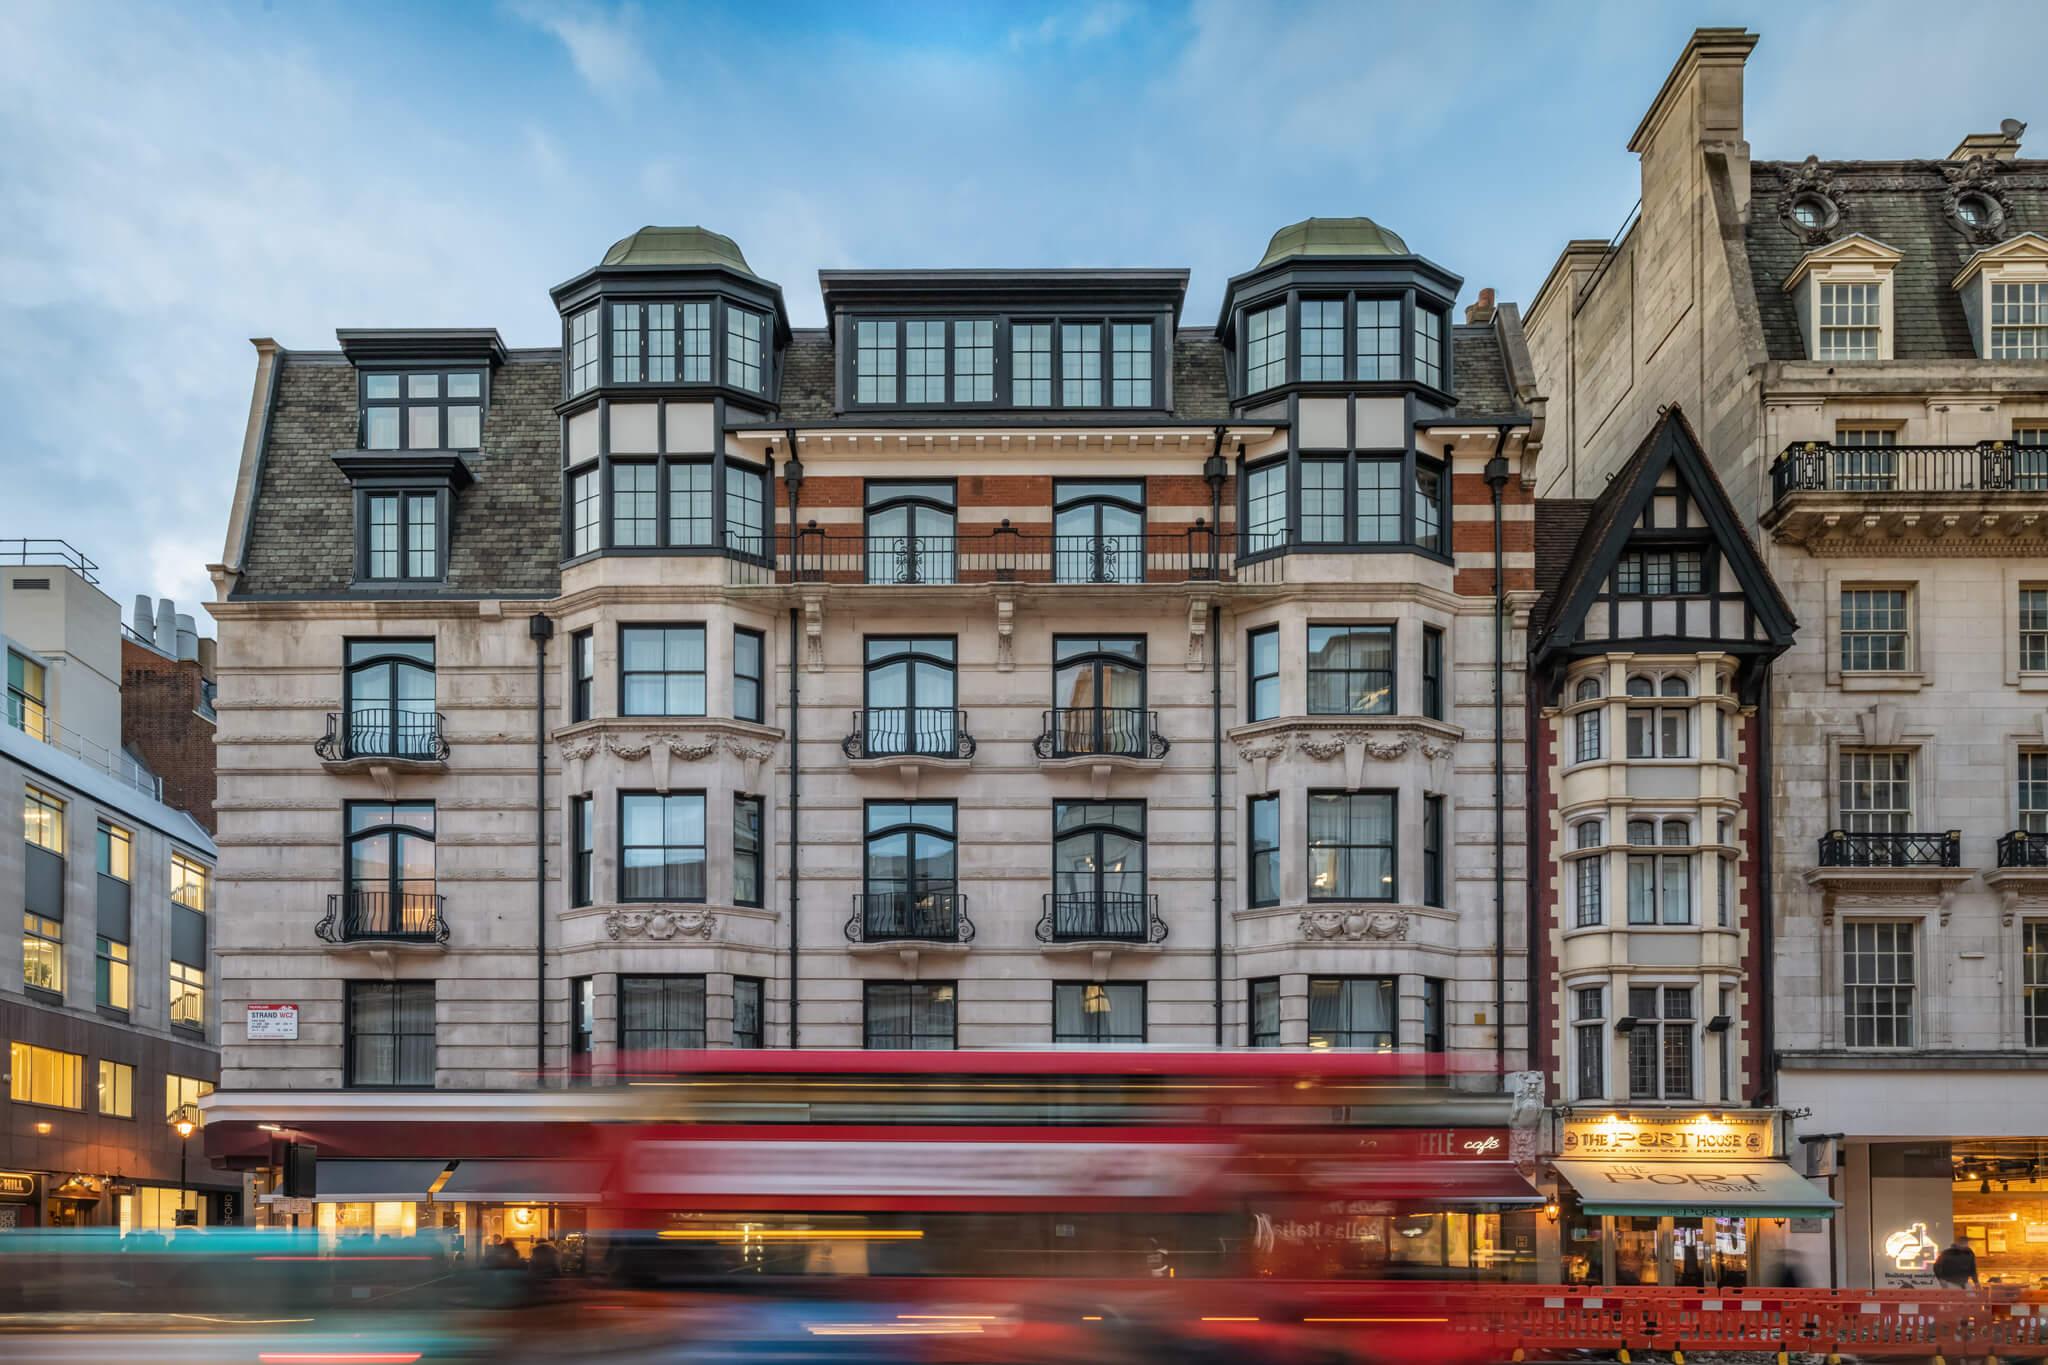 Nadler Hotel Boutique Hotel Covent Garden London